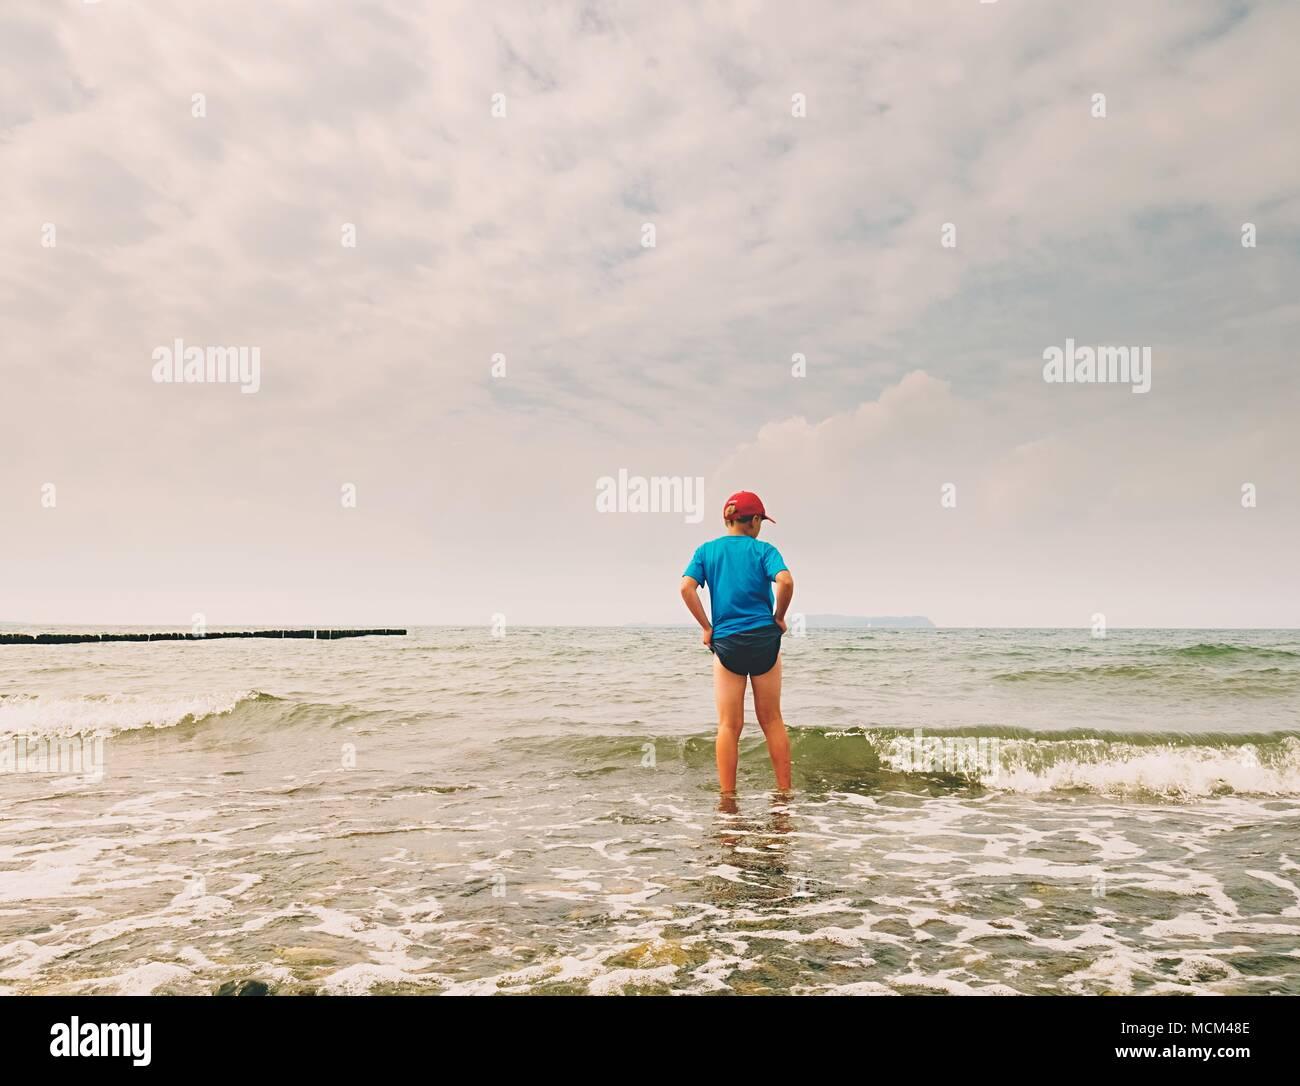 Kinder am Strand ins Meer. Kind Spiel in den Wellen der schäumende Meer. Stockbild